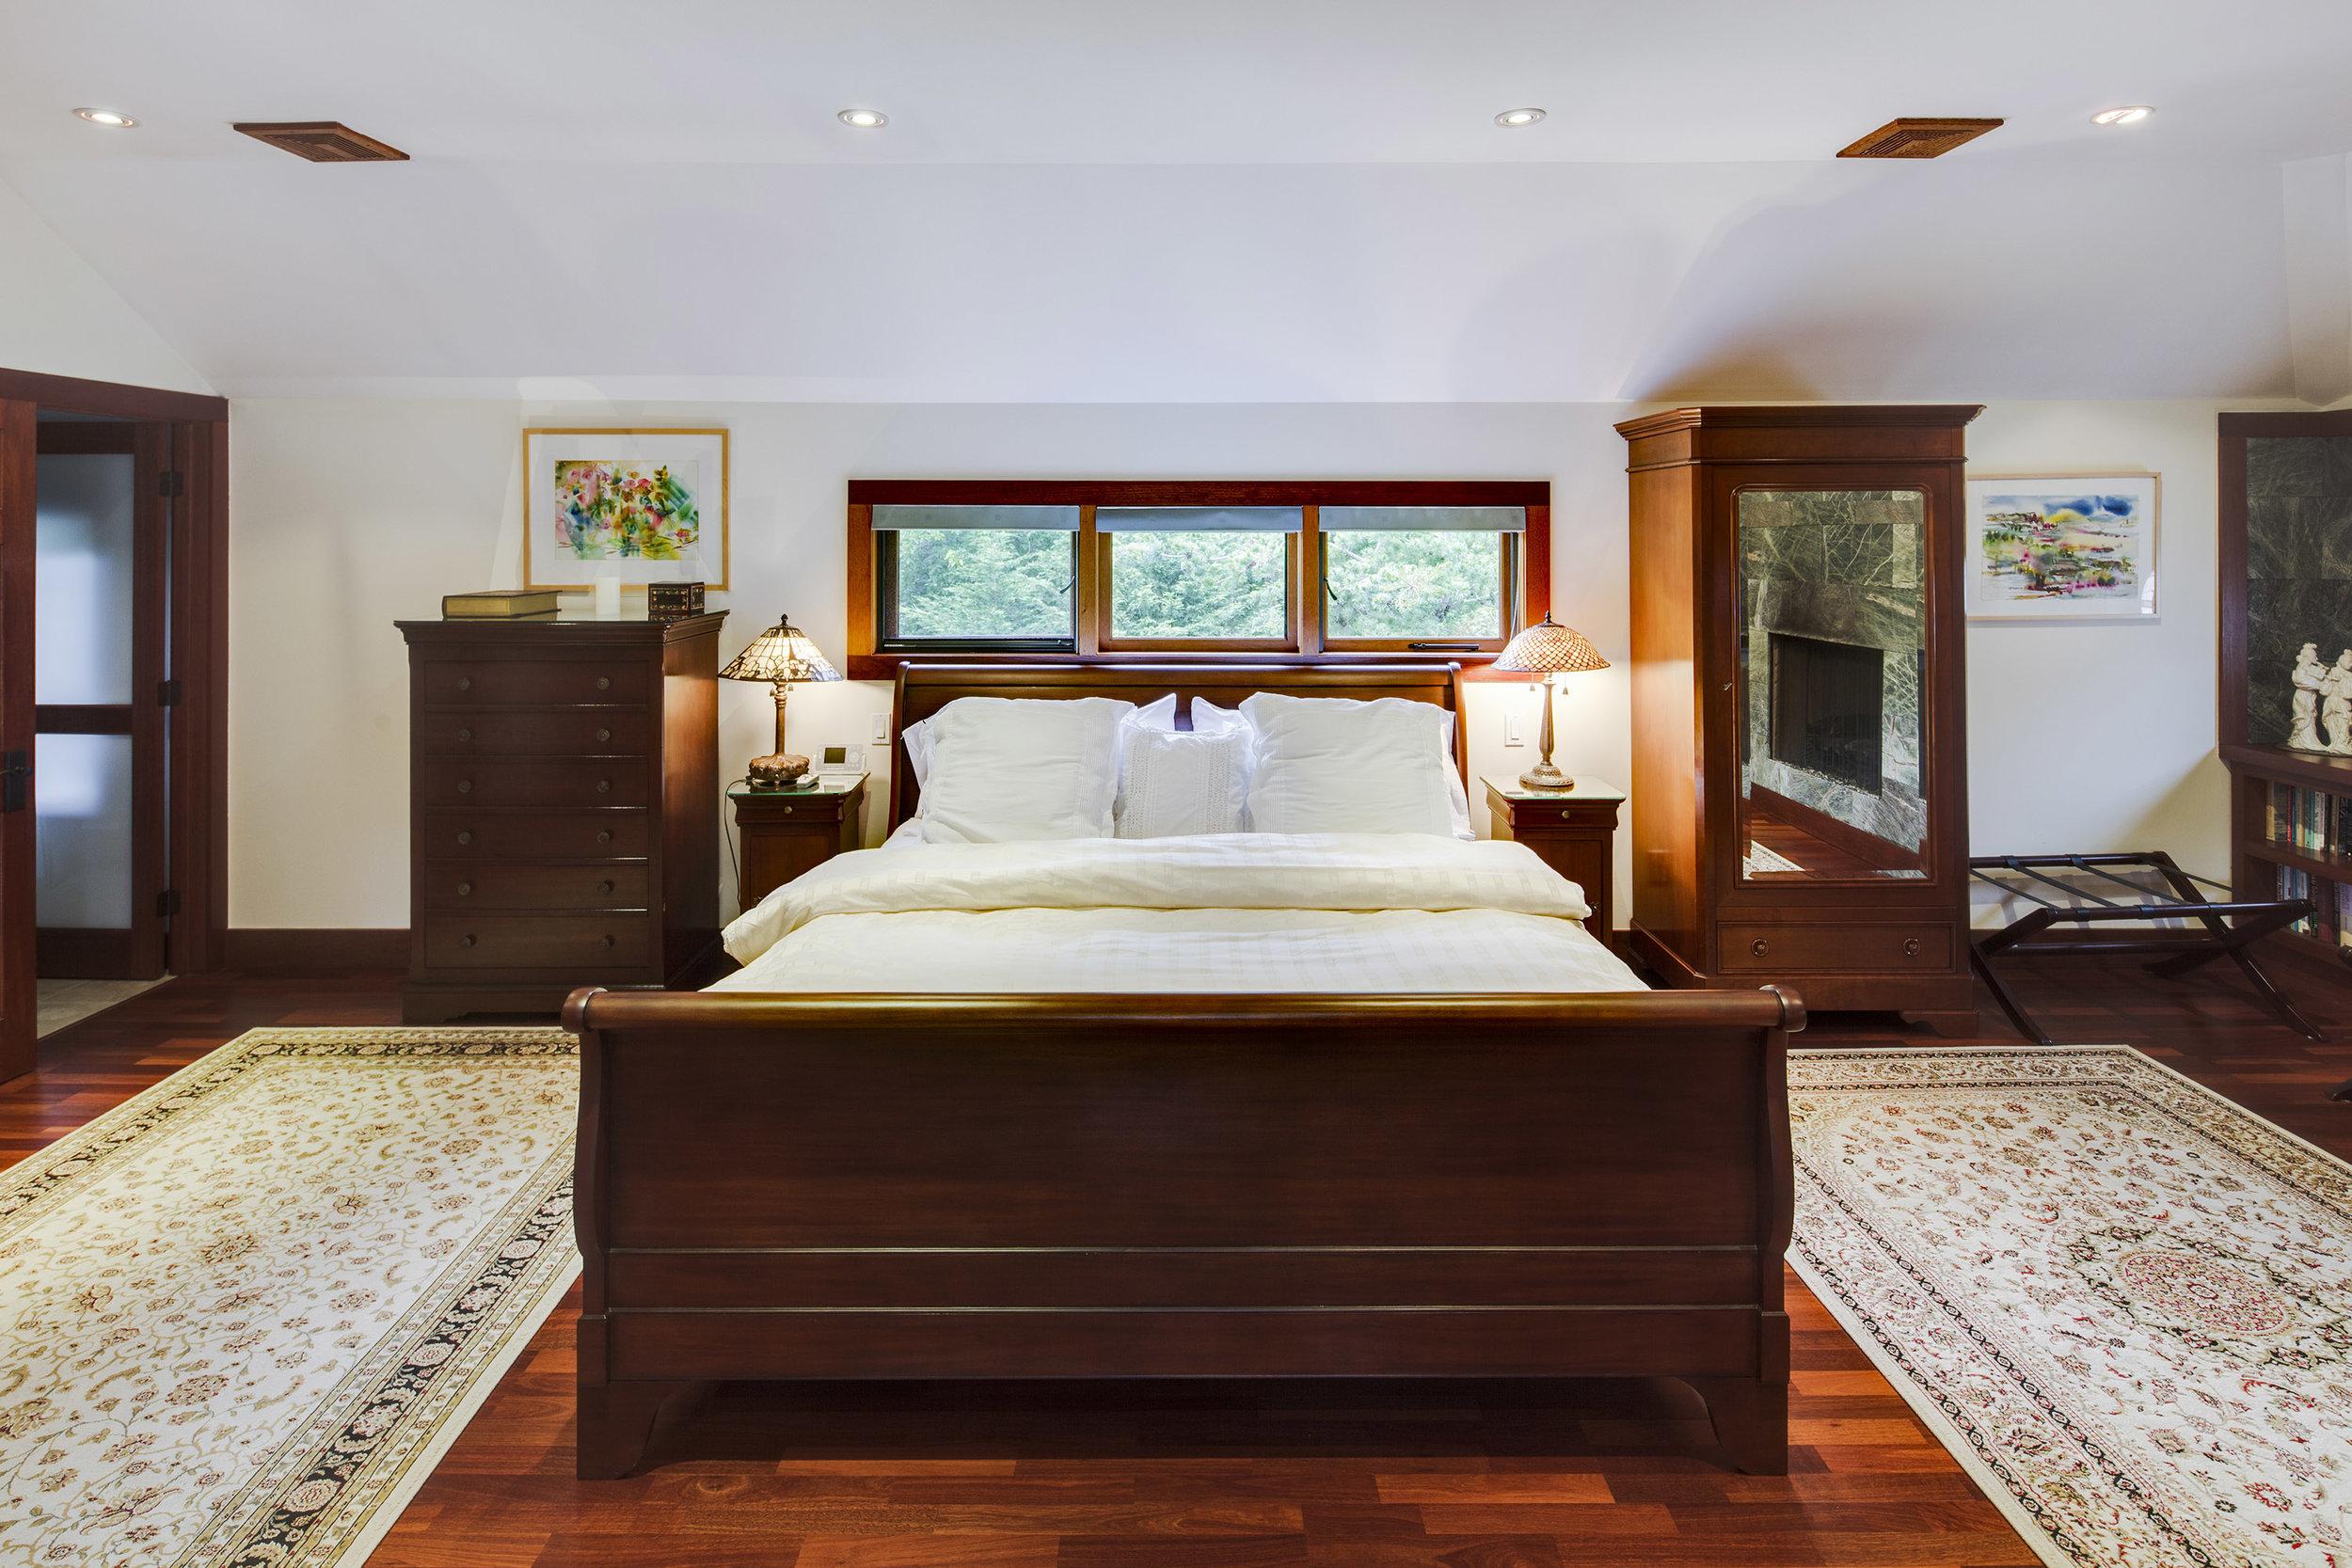 Master Guest Room Bed web.jpg